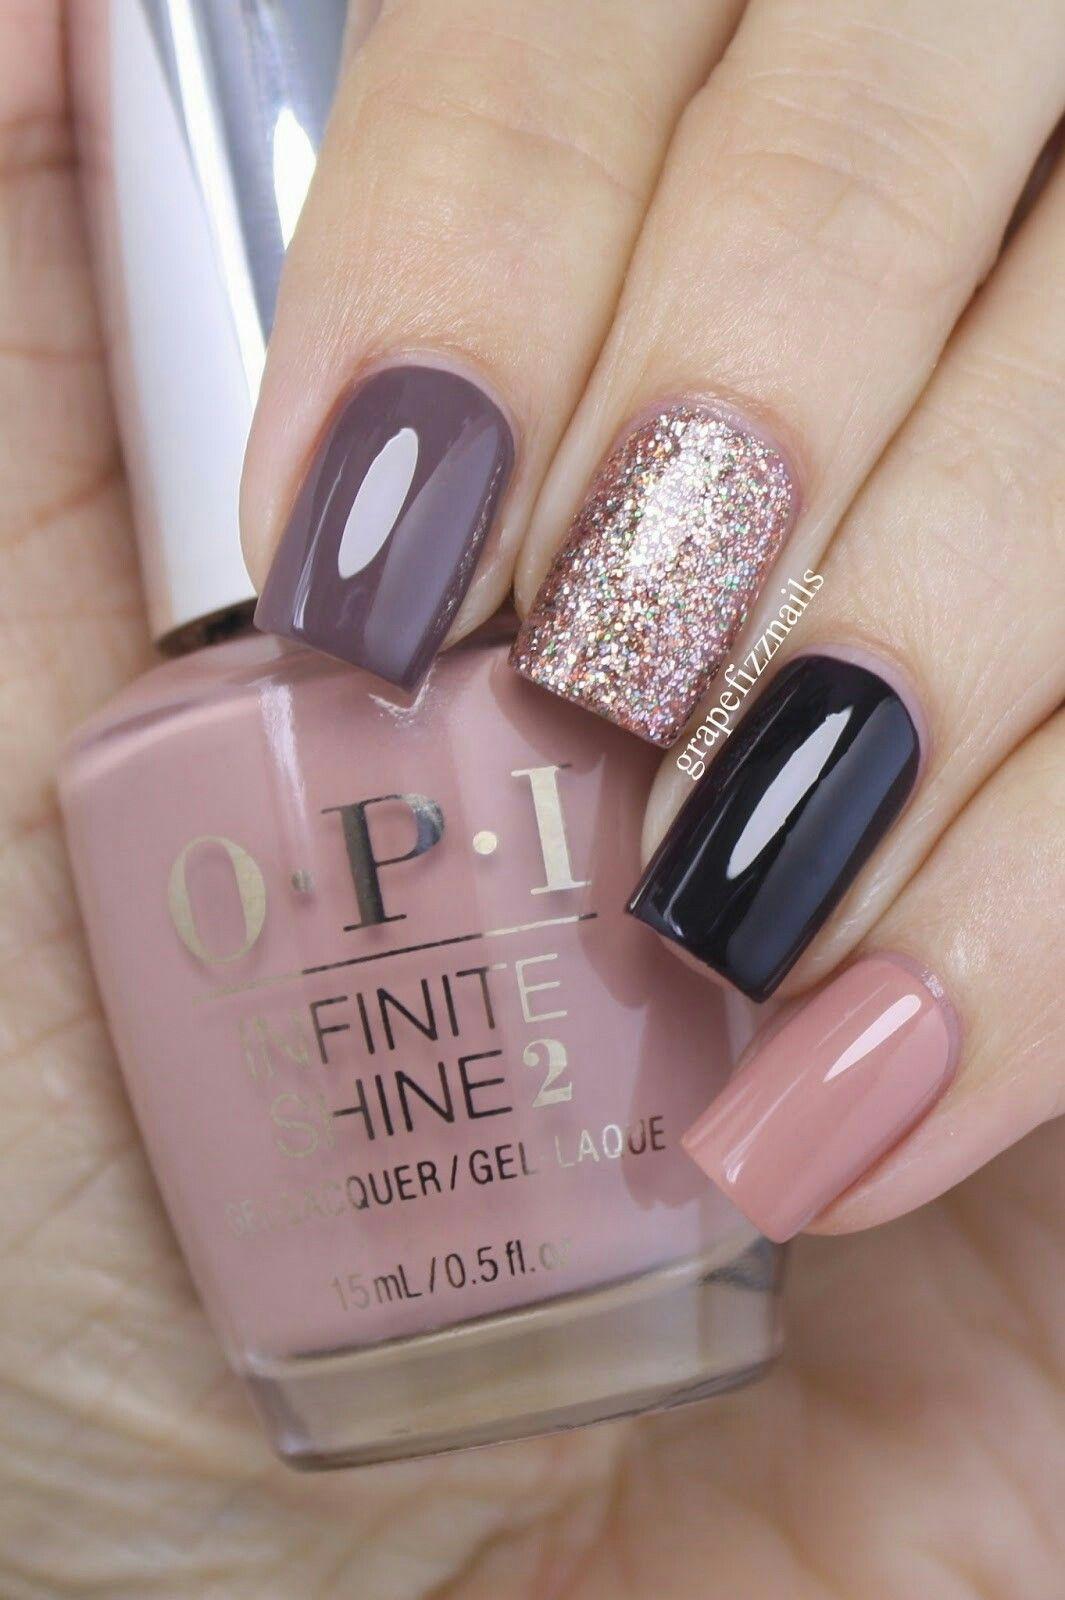 Elegante   uñas lindas   Pinterest   Diseños de uñas, Uña decoradas ...